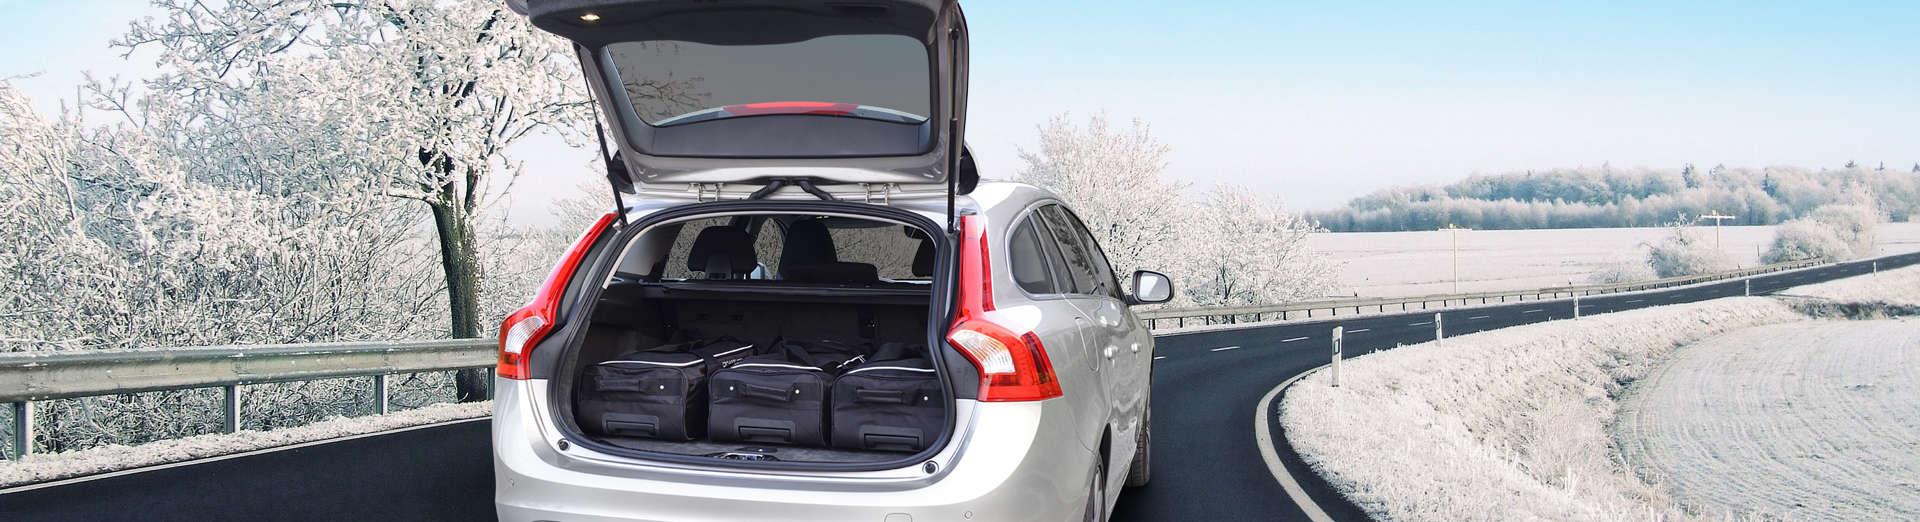 car-bags-concept-1